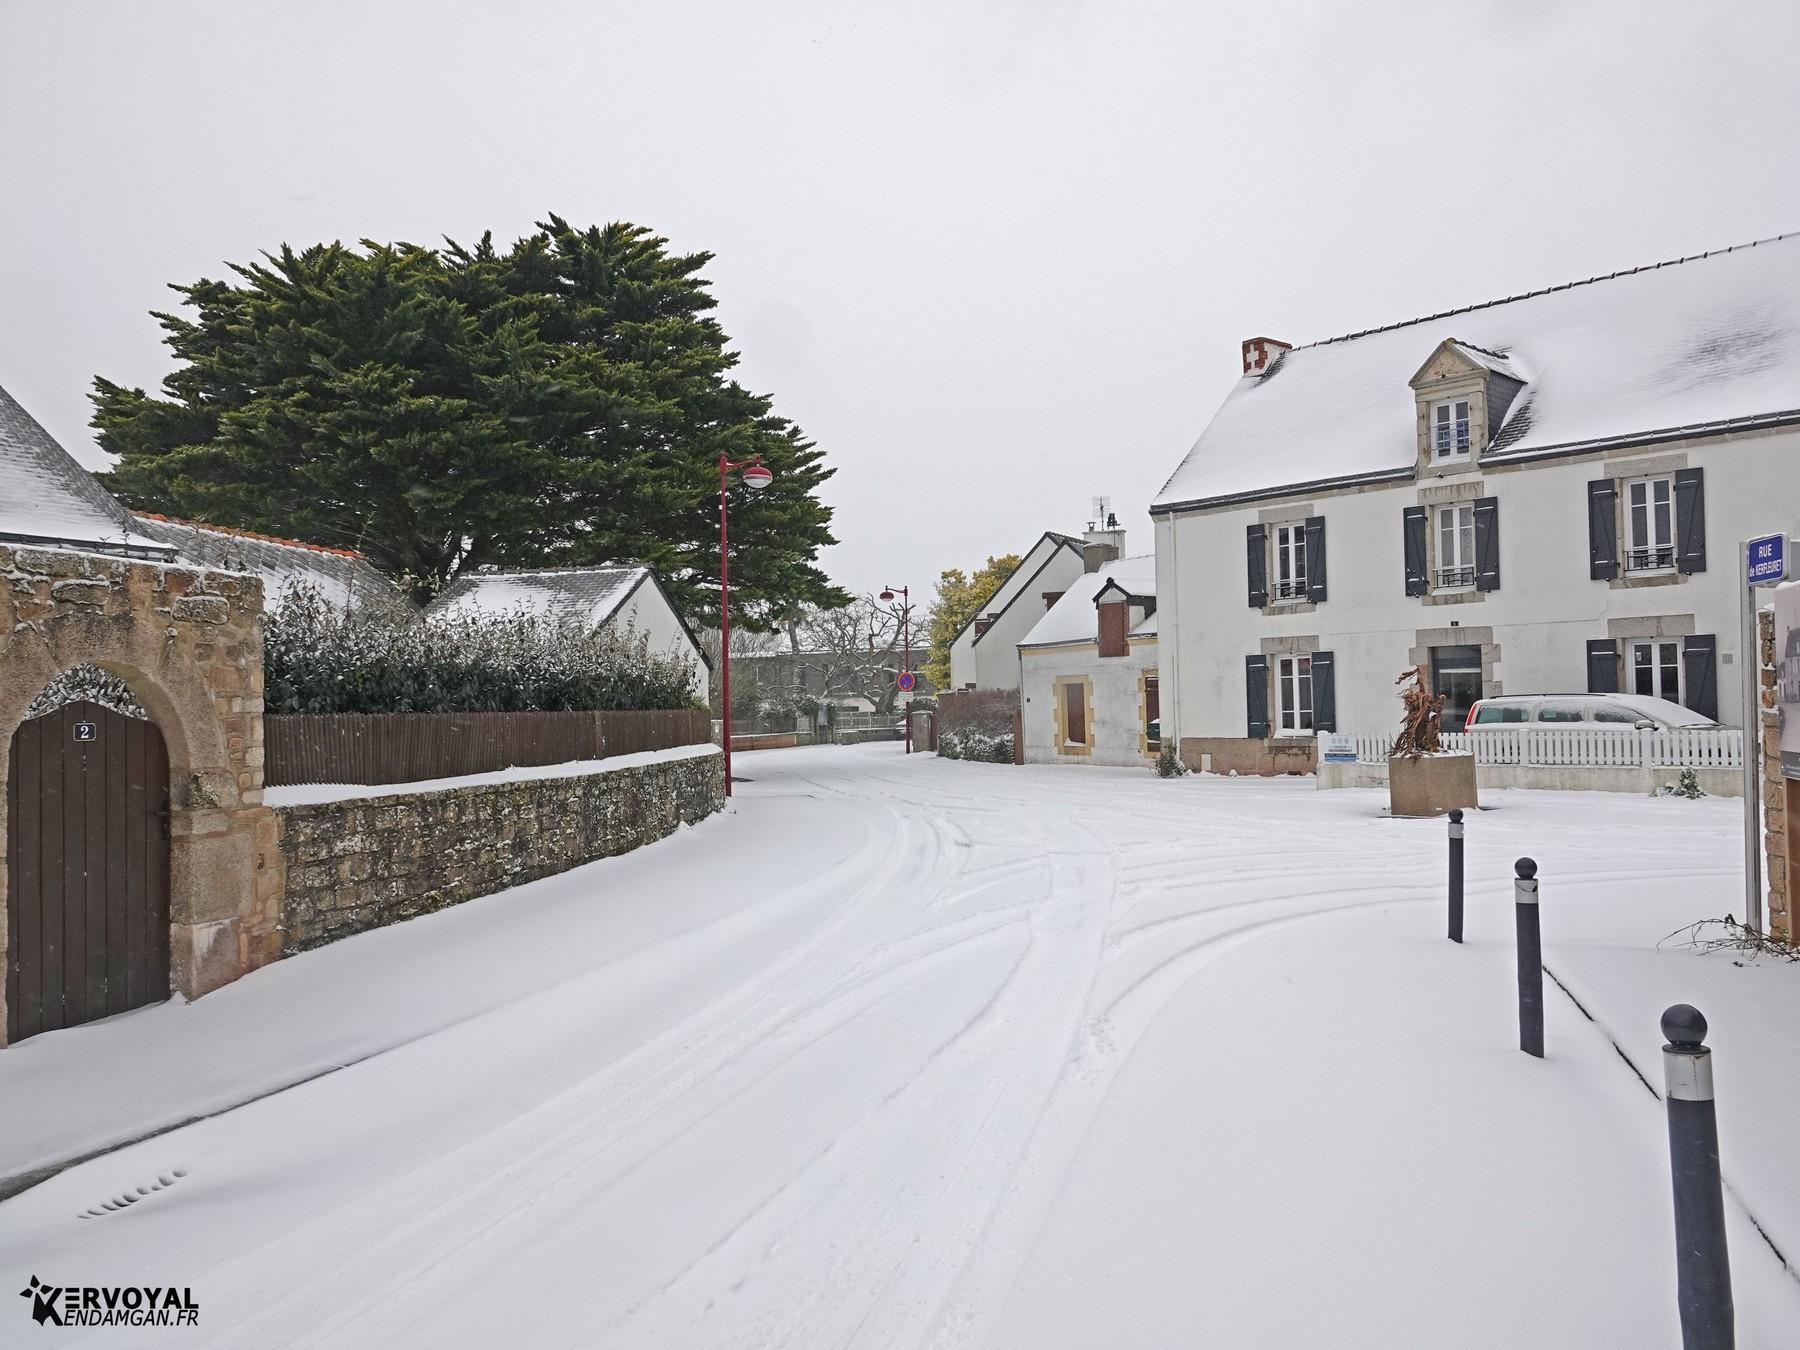 neige à kervoyal 11 février 2021 damgan morbihan (13)